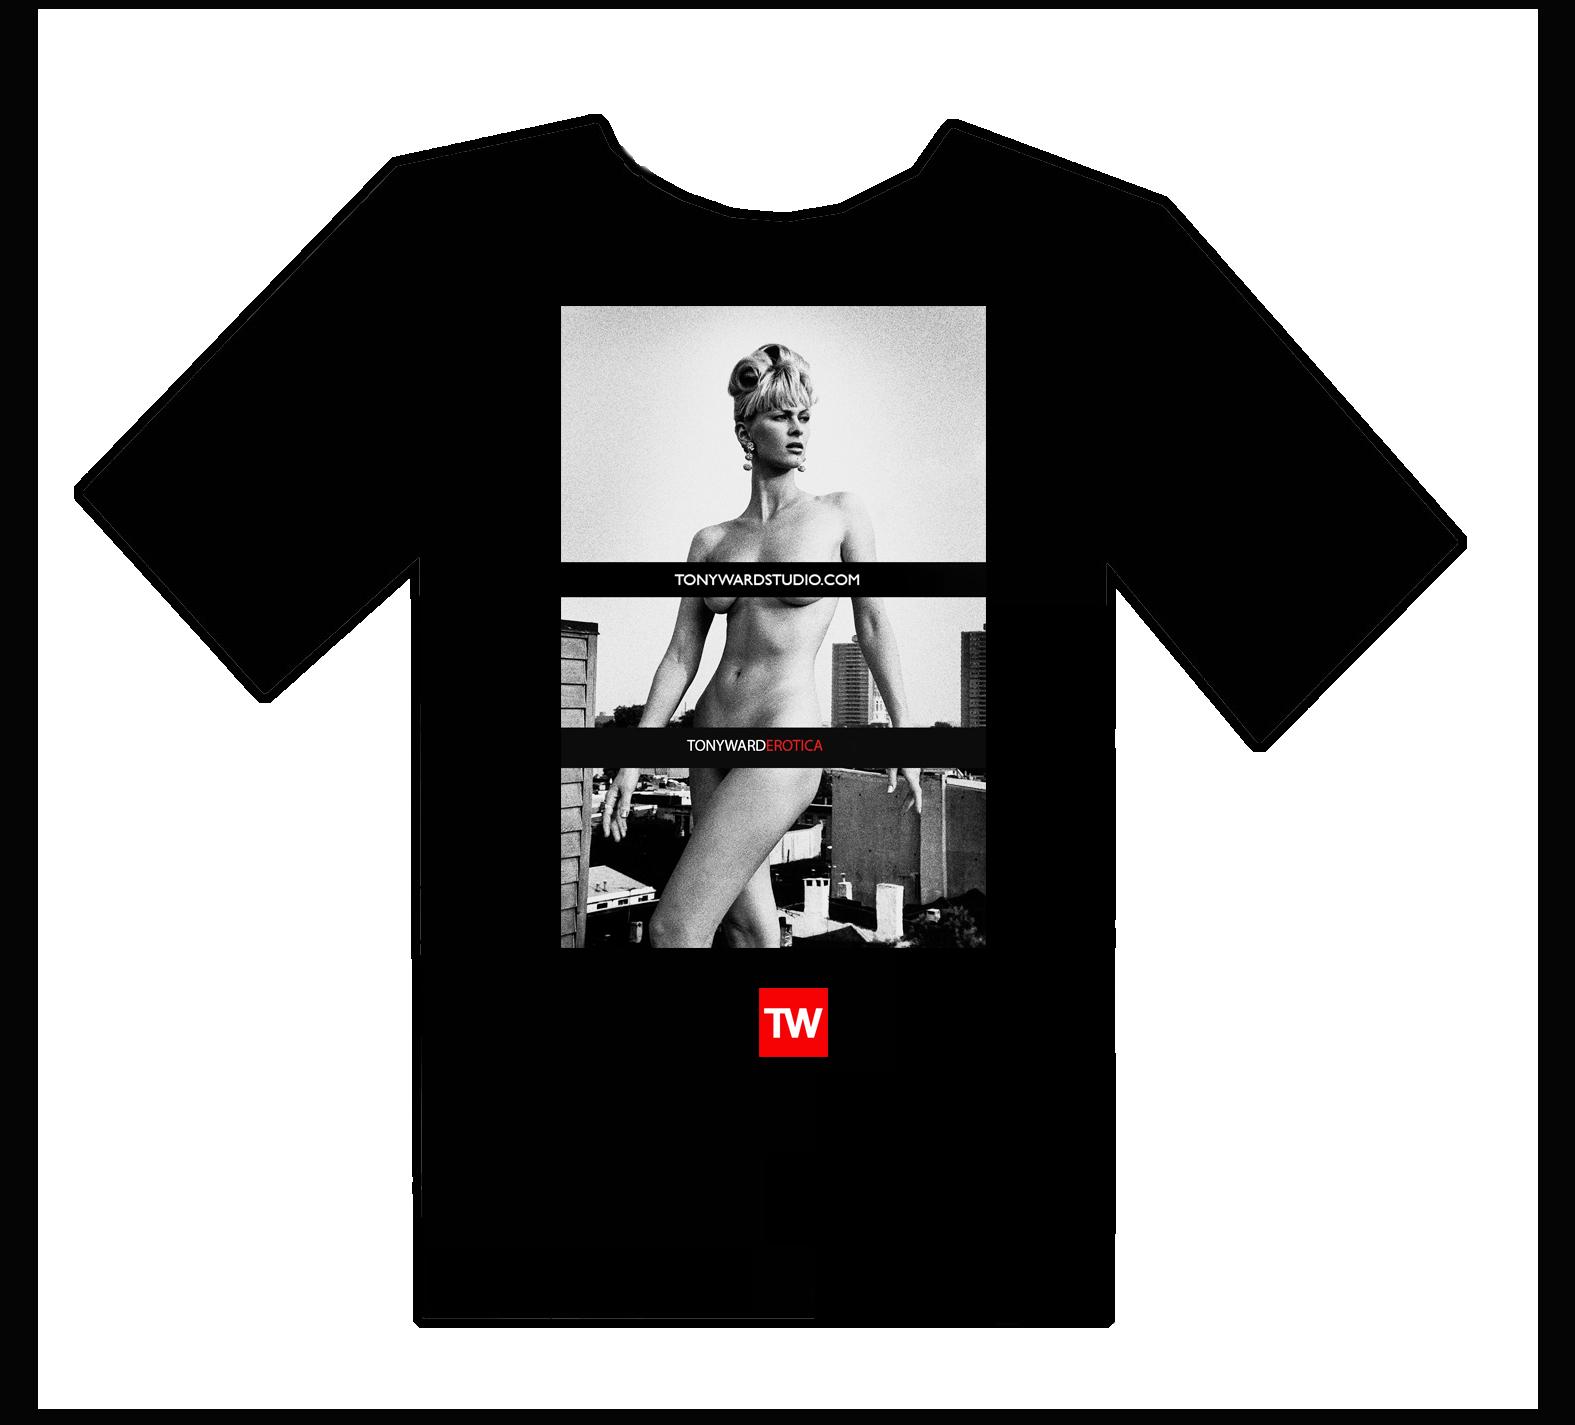 Tony_Ward_Summer_tshirts_erotica_studio_nudes_store_merchandize_buy_now